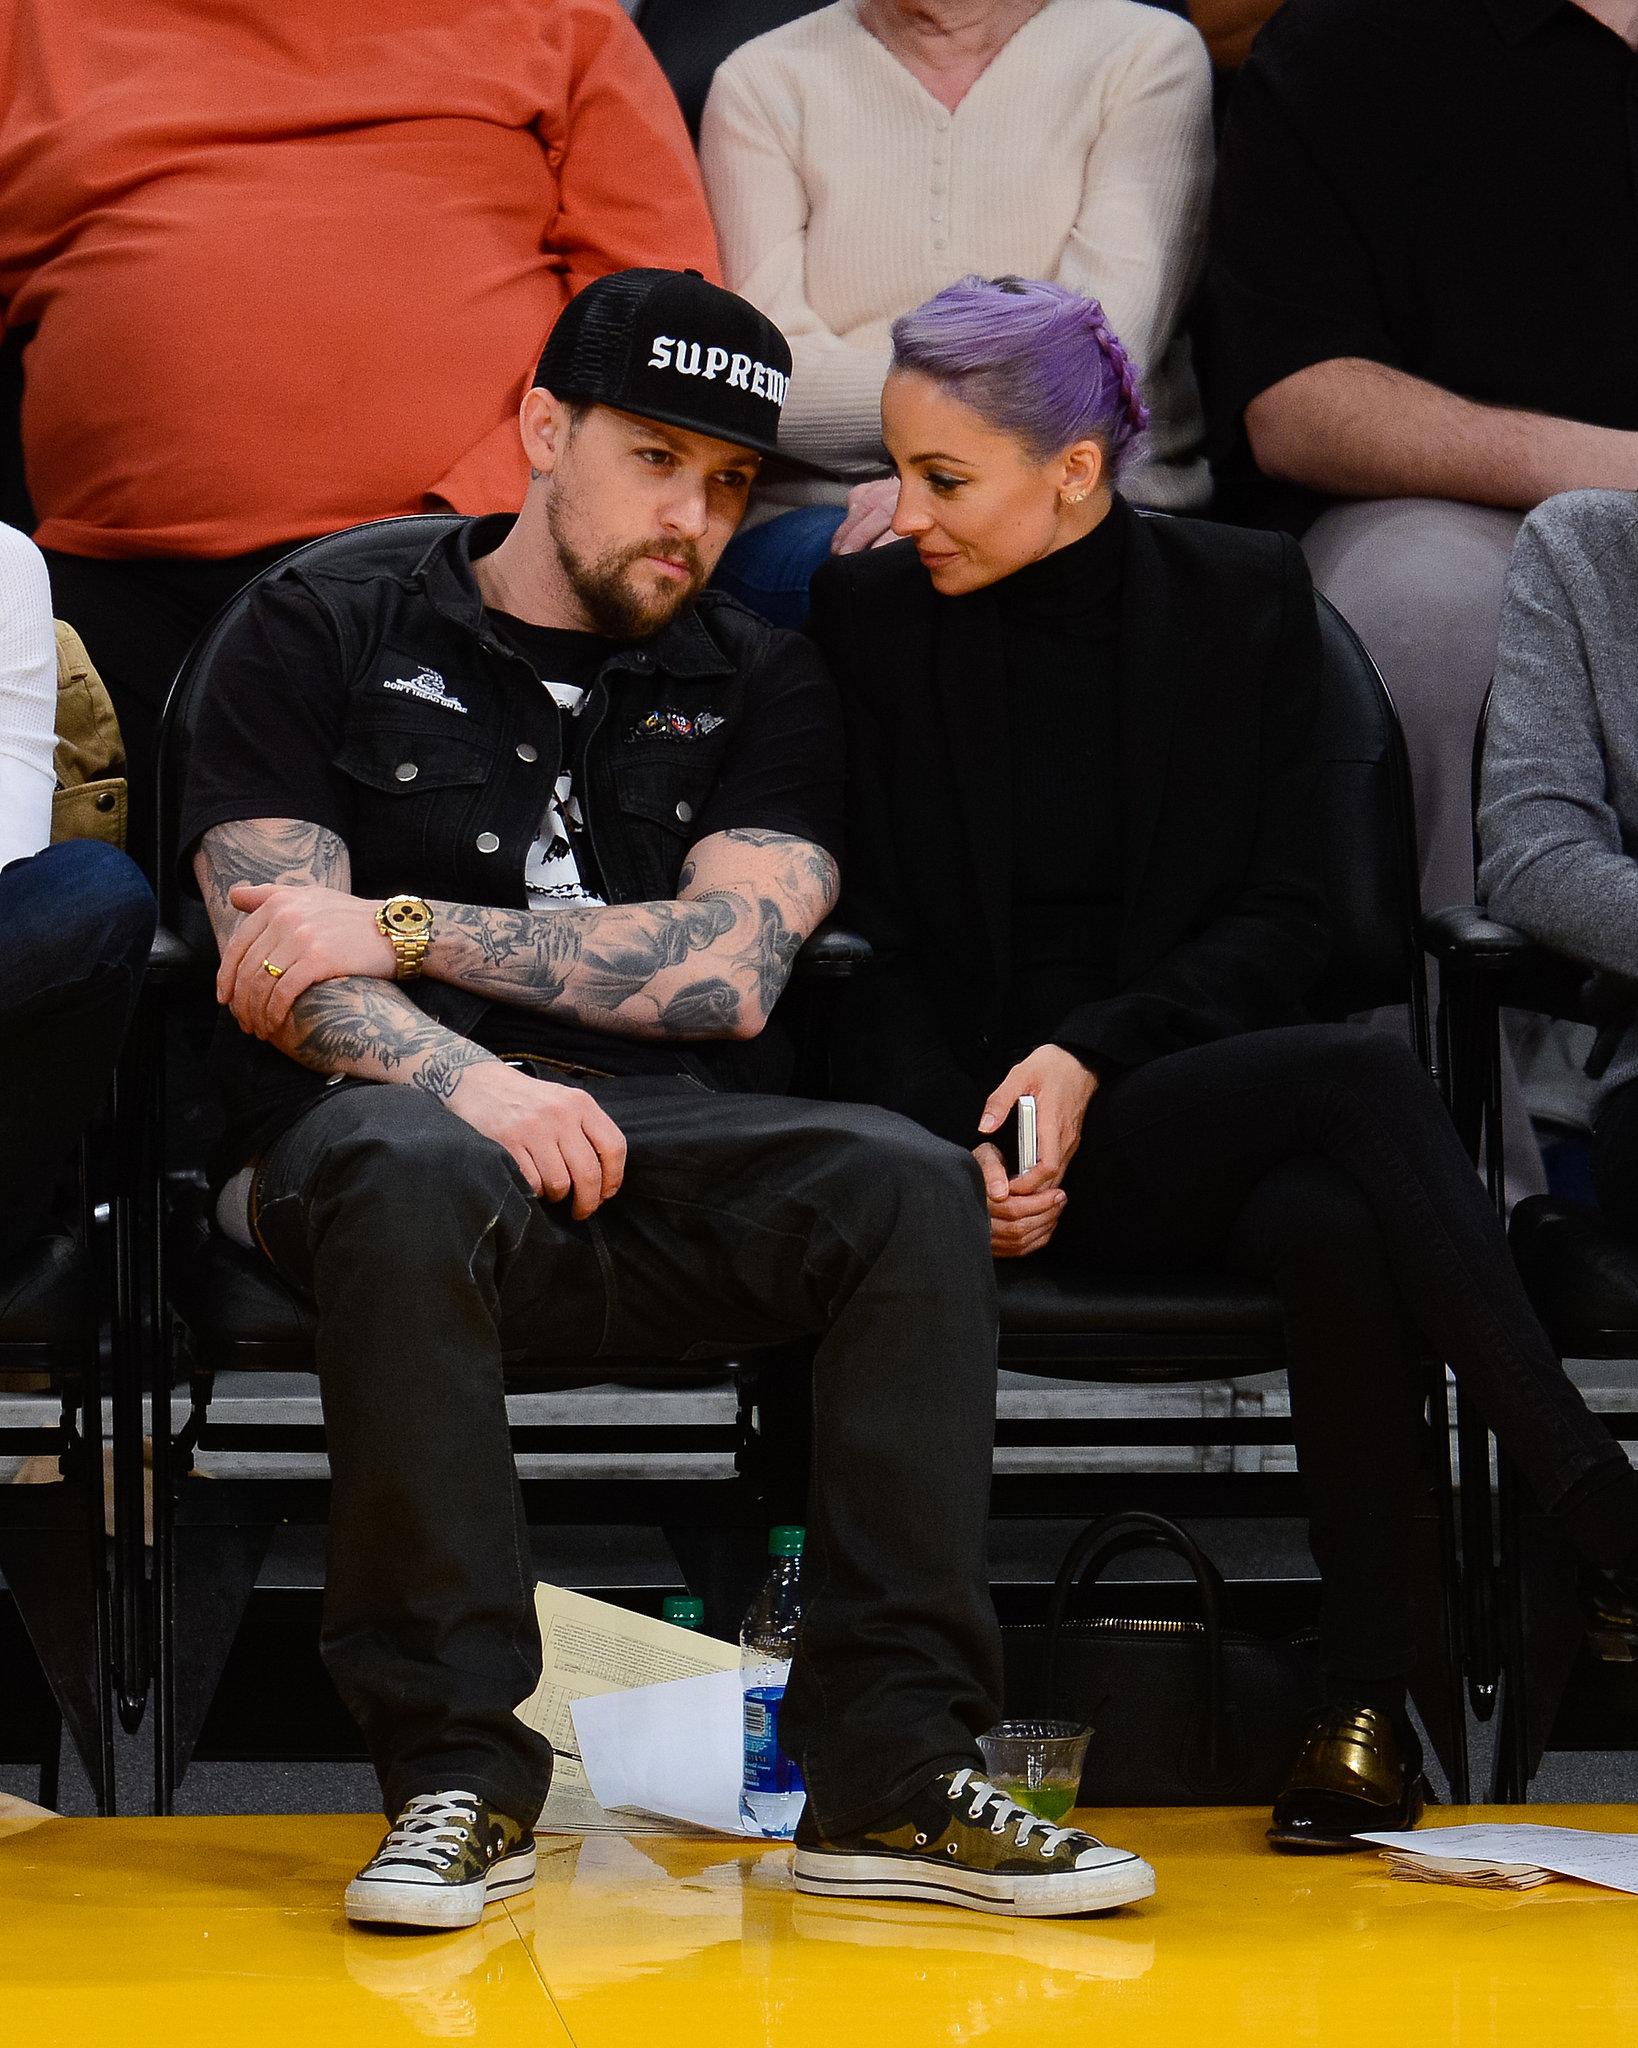 Nicole and Joel Celebrate Their Big Week With a Basketball Game